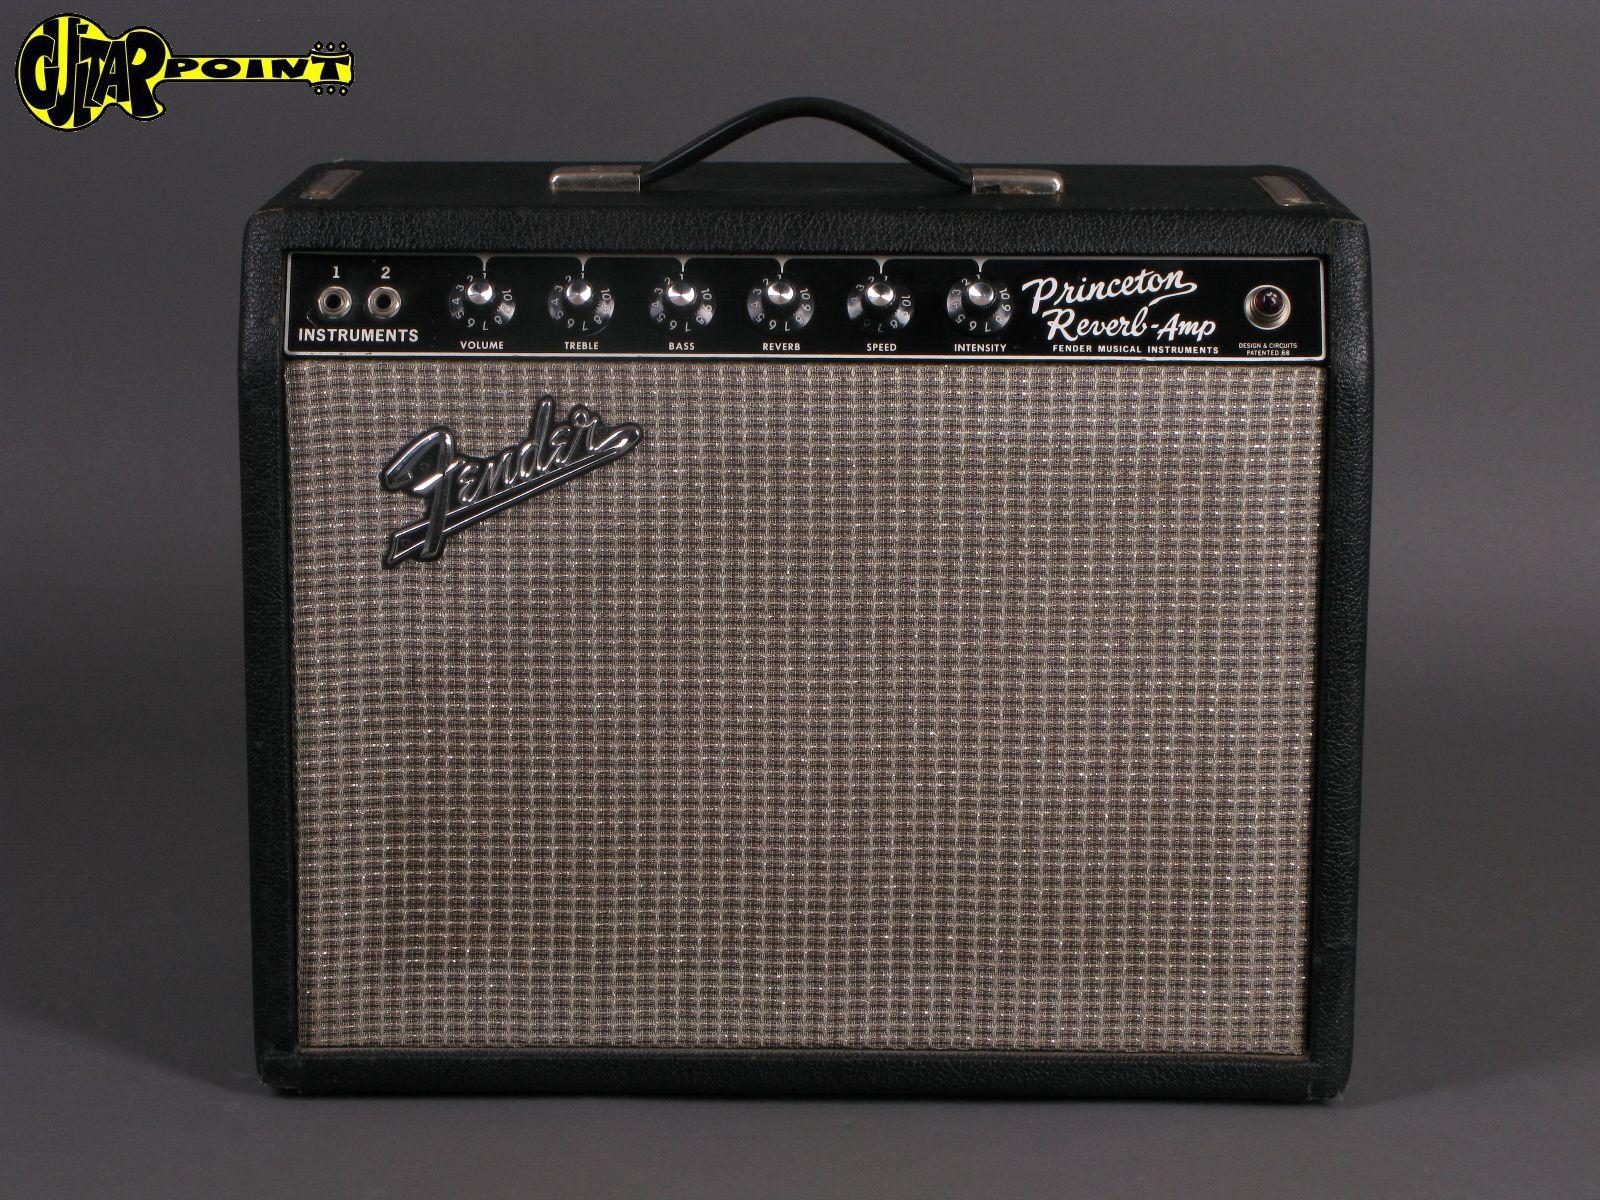 1967 Fender Princeton  Reverb Amp